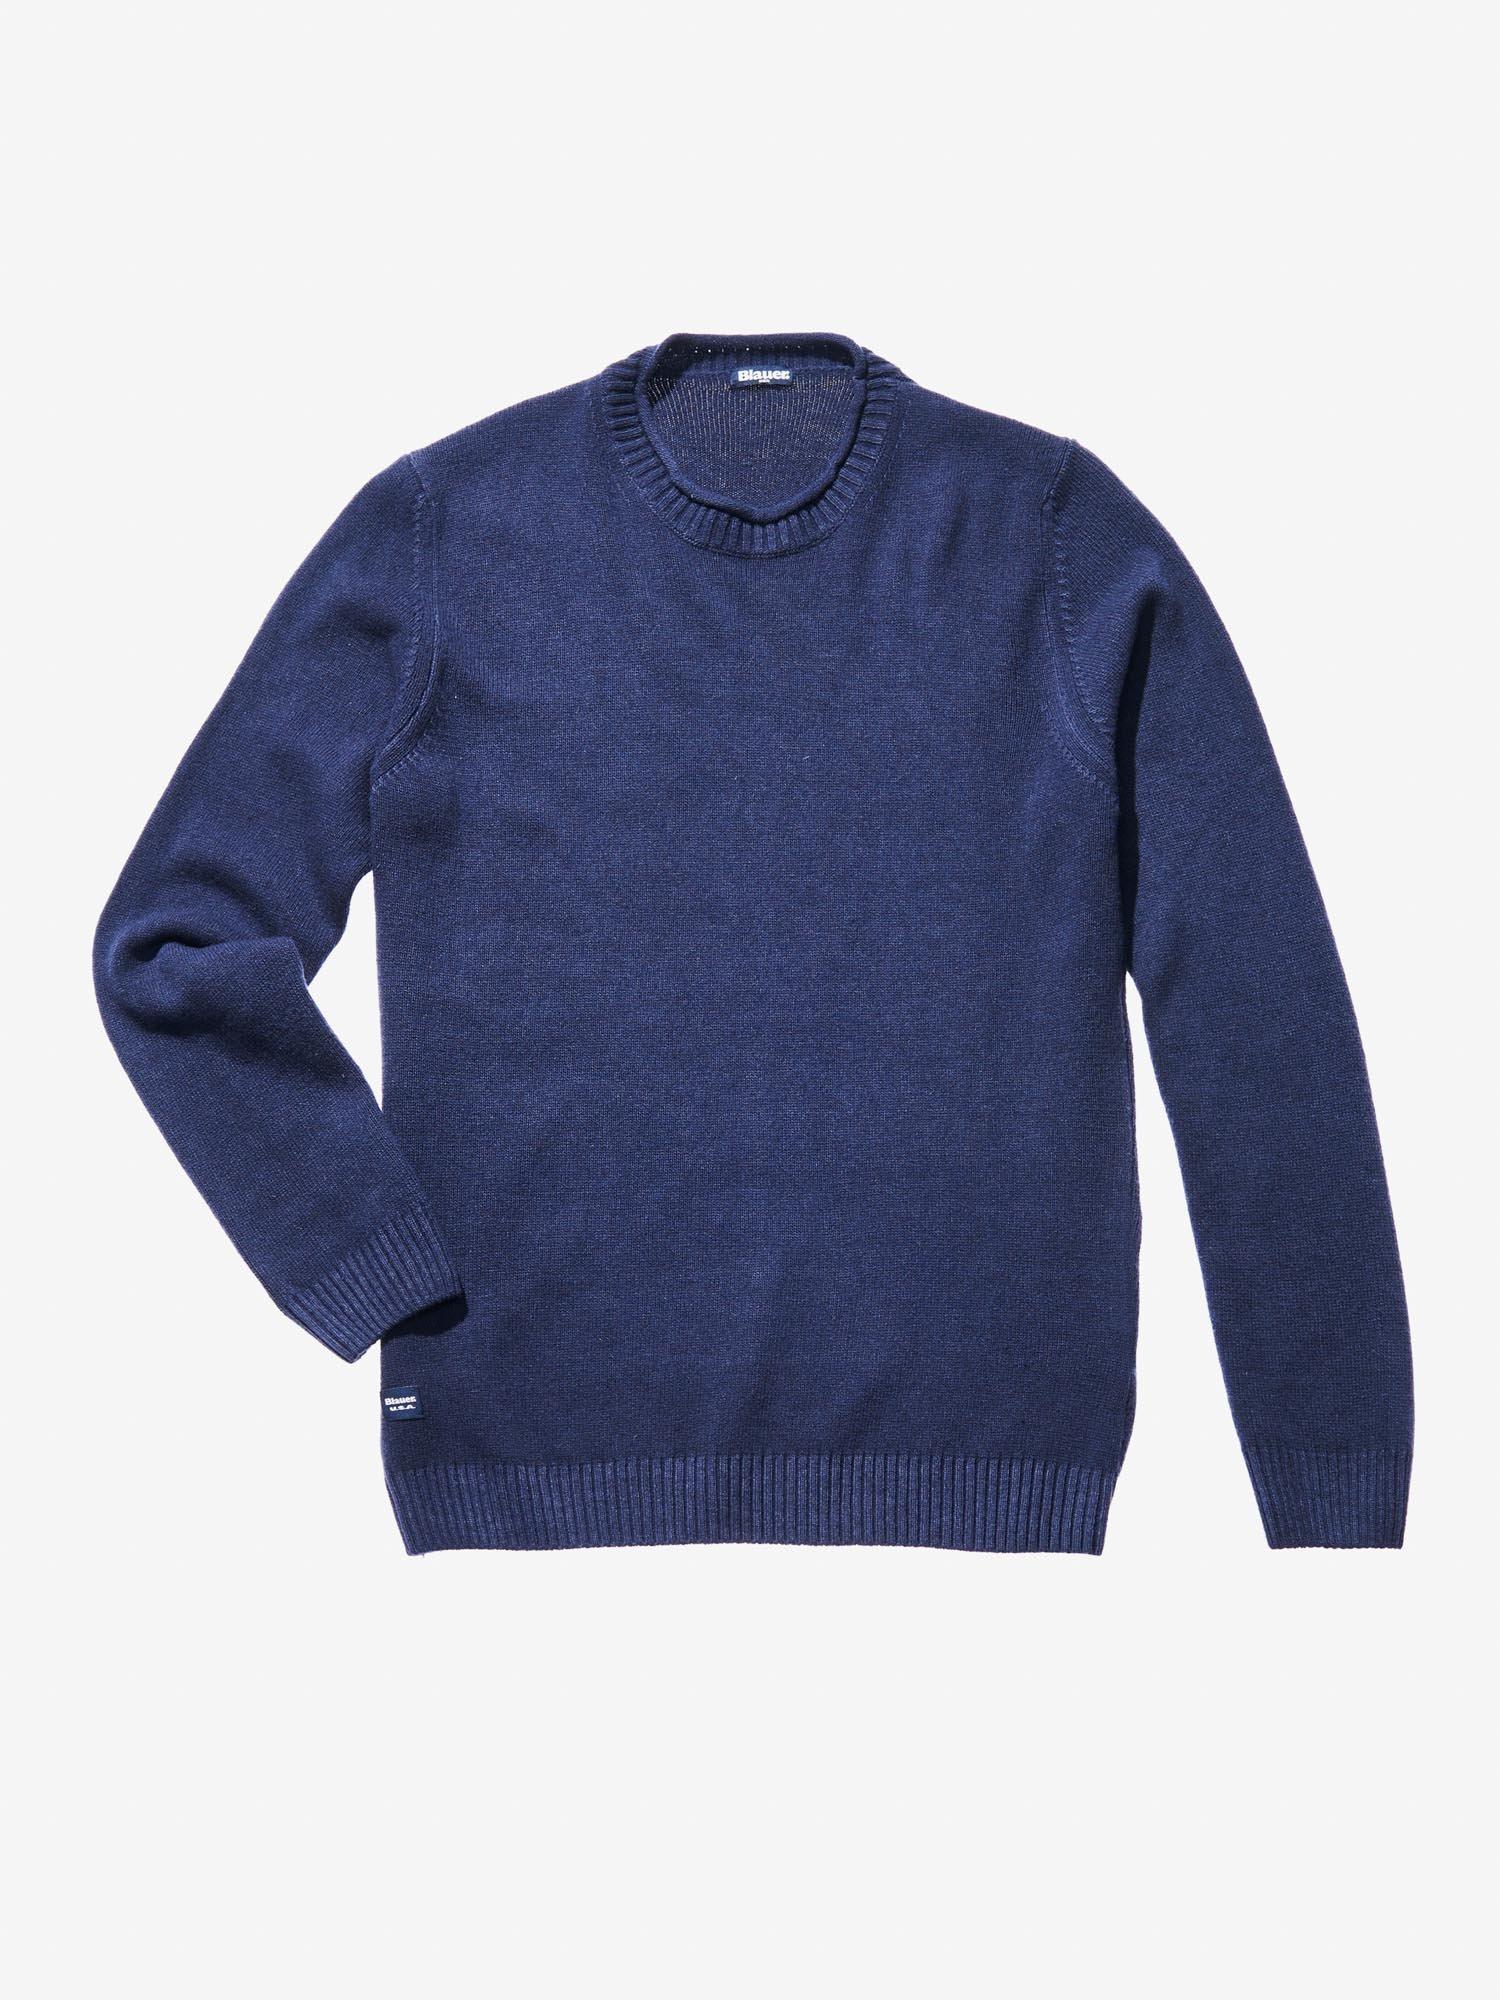 CREW NECK GARMENT DYED WOOL-BLEND SWEATER - Blauer